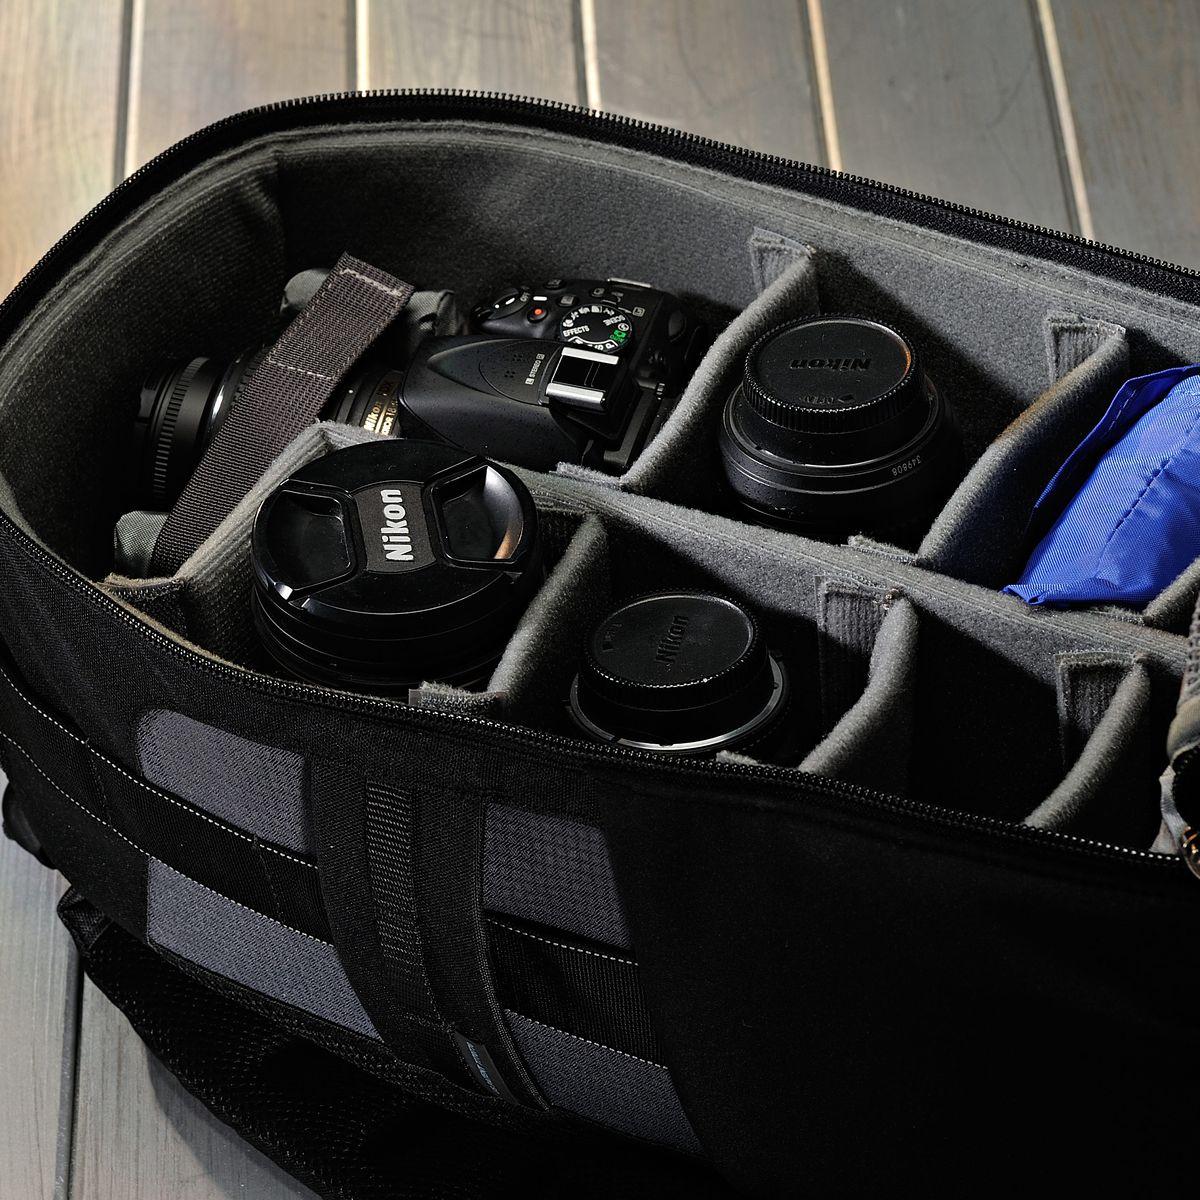 11 Best Camera Bags 2019 The Strategist New York Magazine